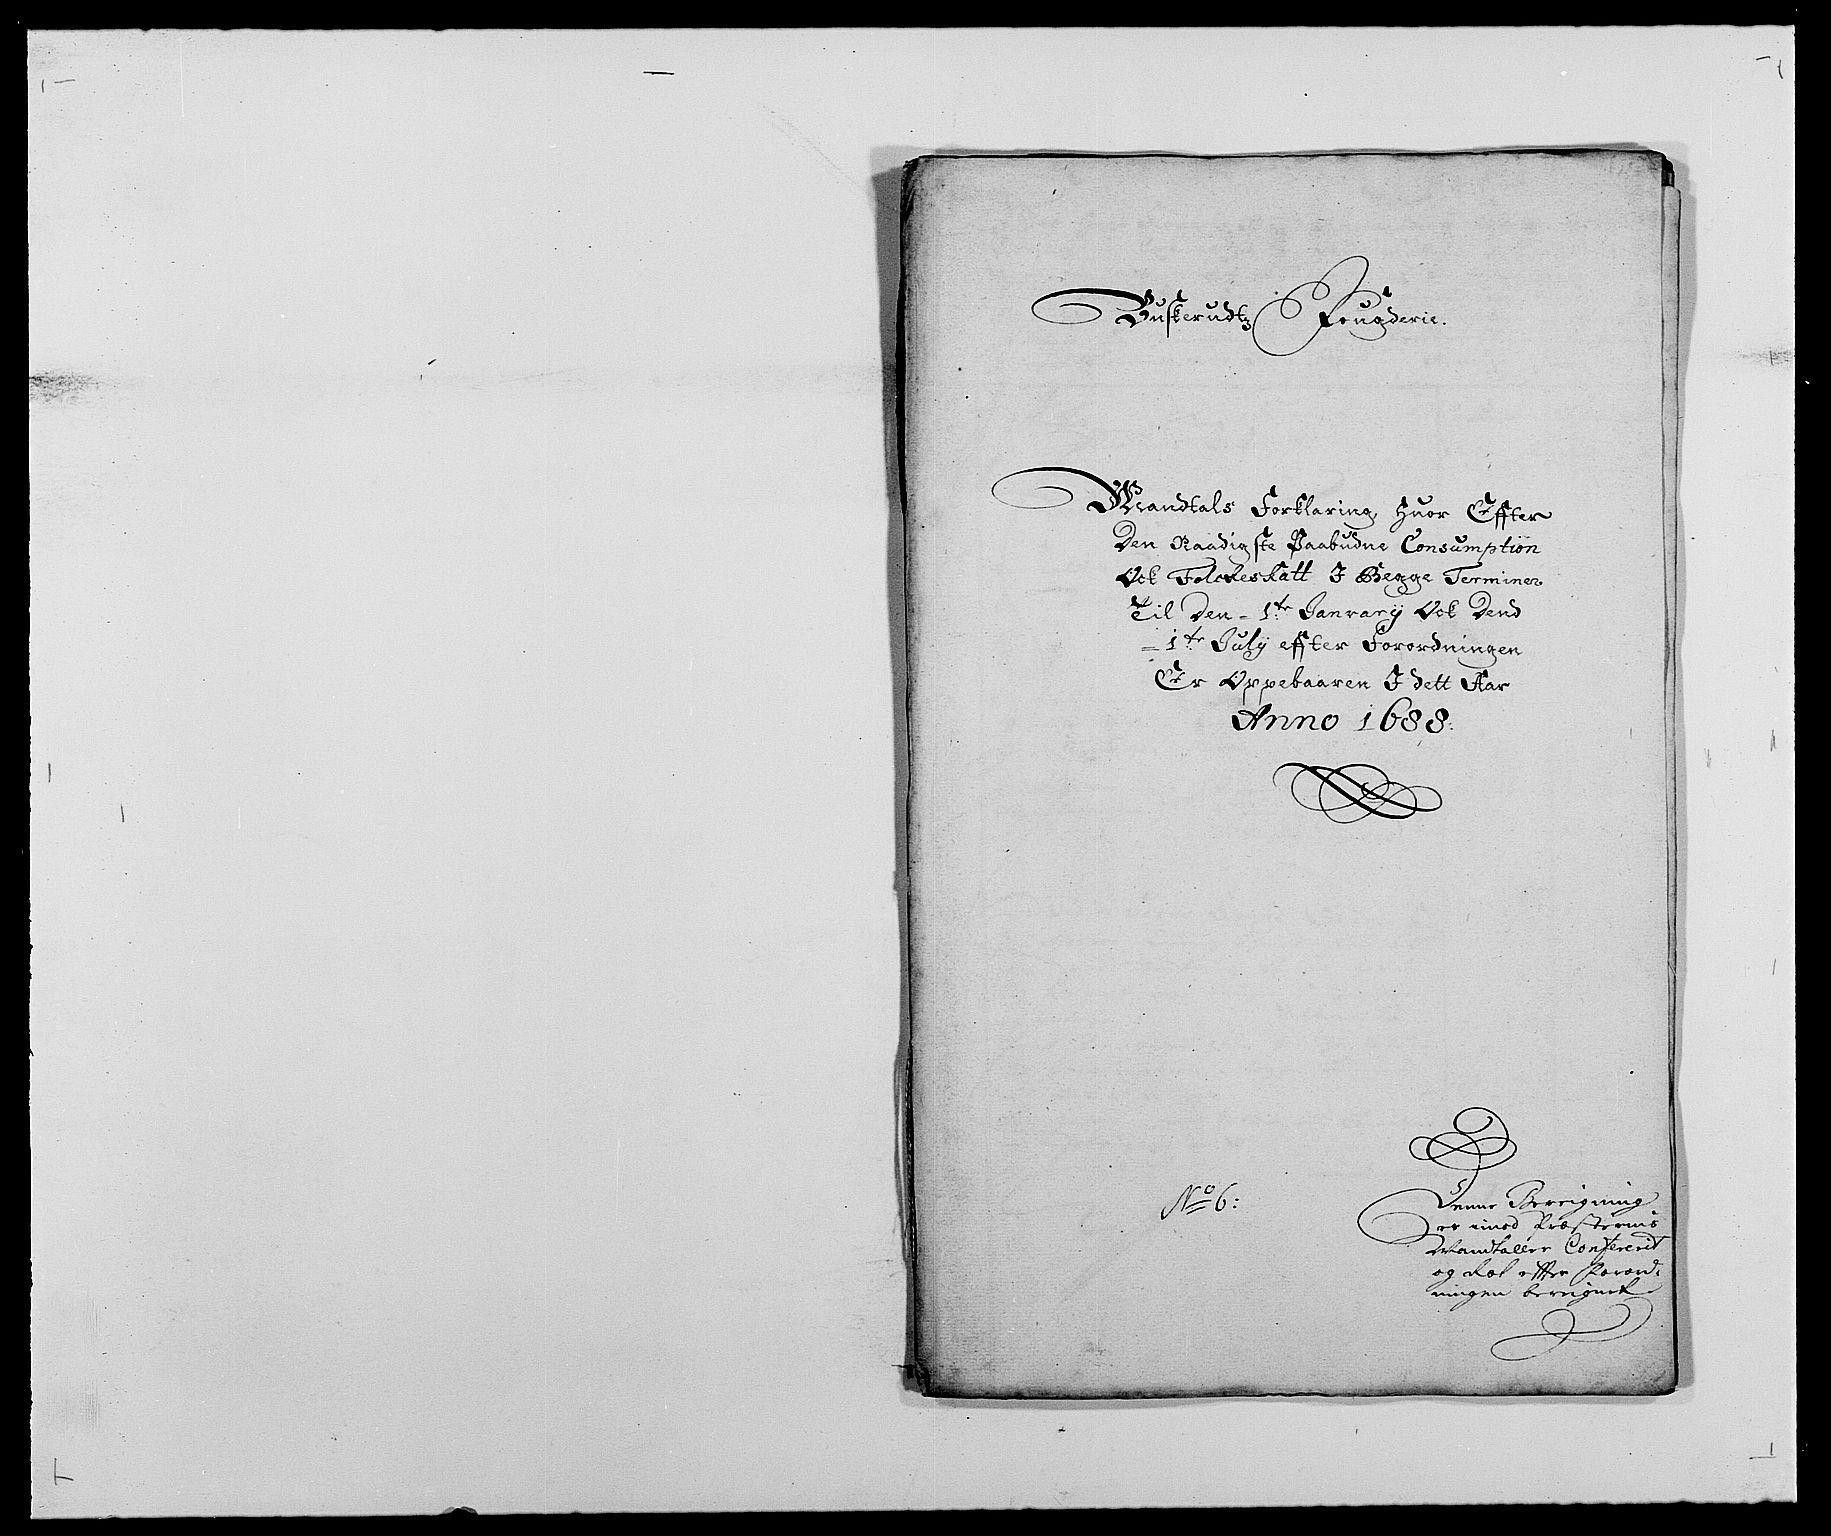 RA, Rentekammeret inntil 1814, Reviderte regnskaper, Fogderegnskap, R25/L1679: Fogderegnskap Buskerud, 1687-1688, s. 447